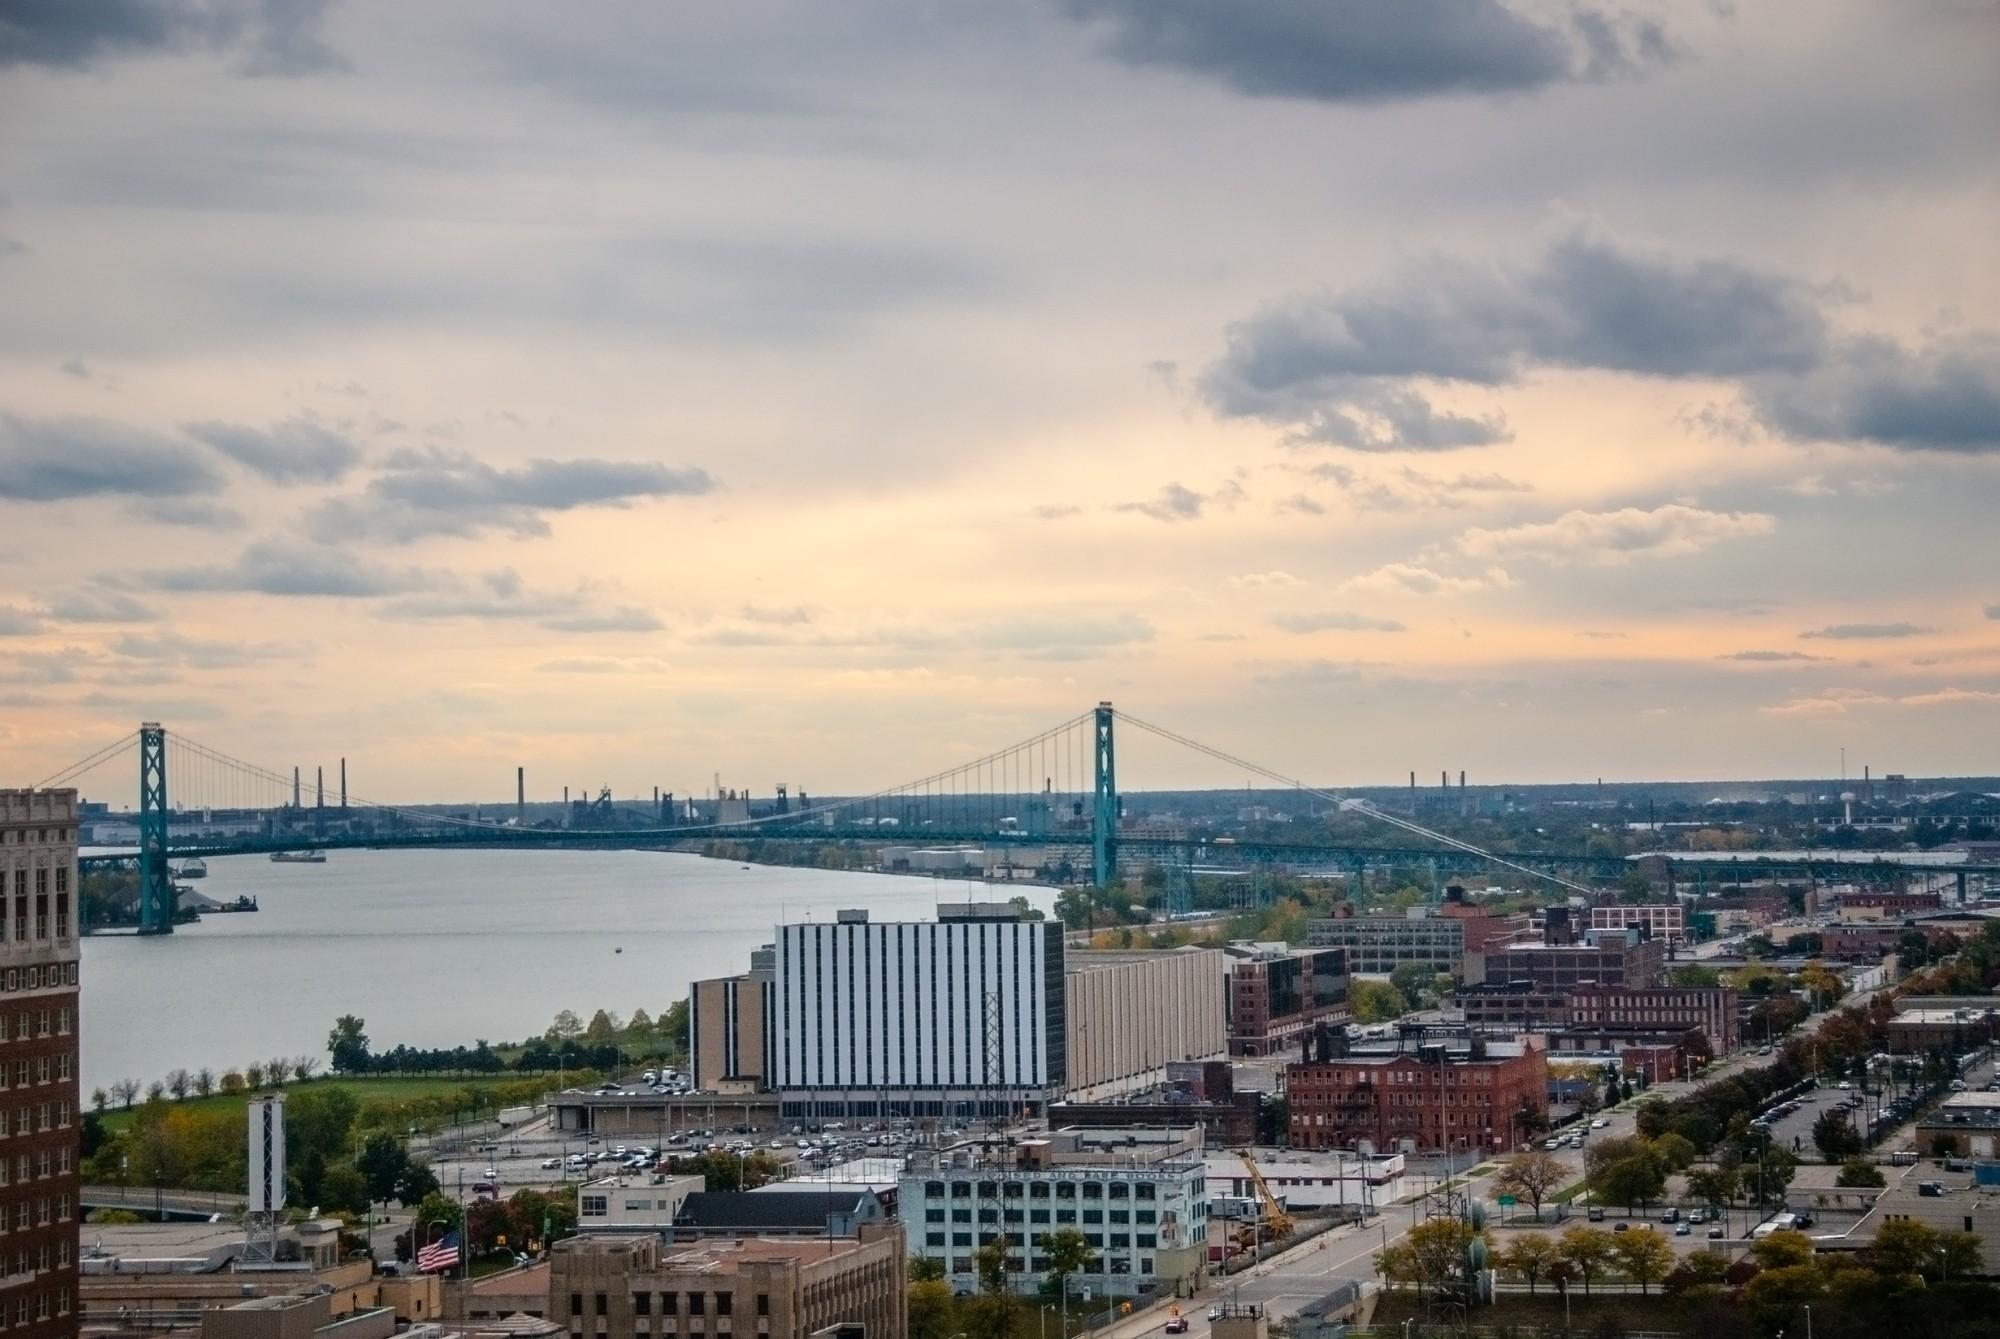 Ambassador Bridge that spans between Windsor, Ontario and Detroit, Michigan